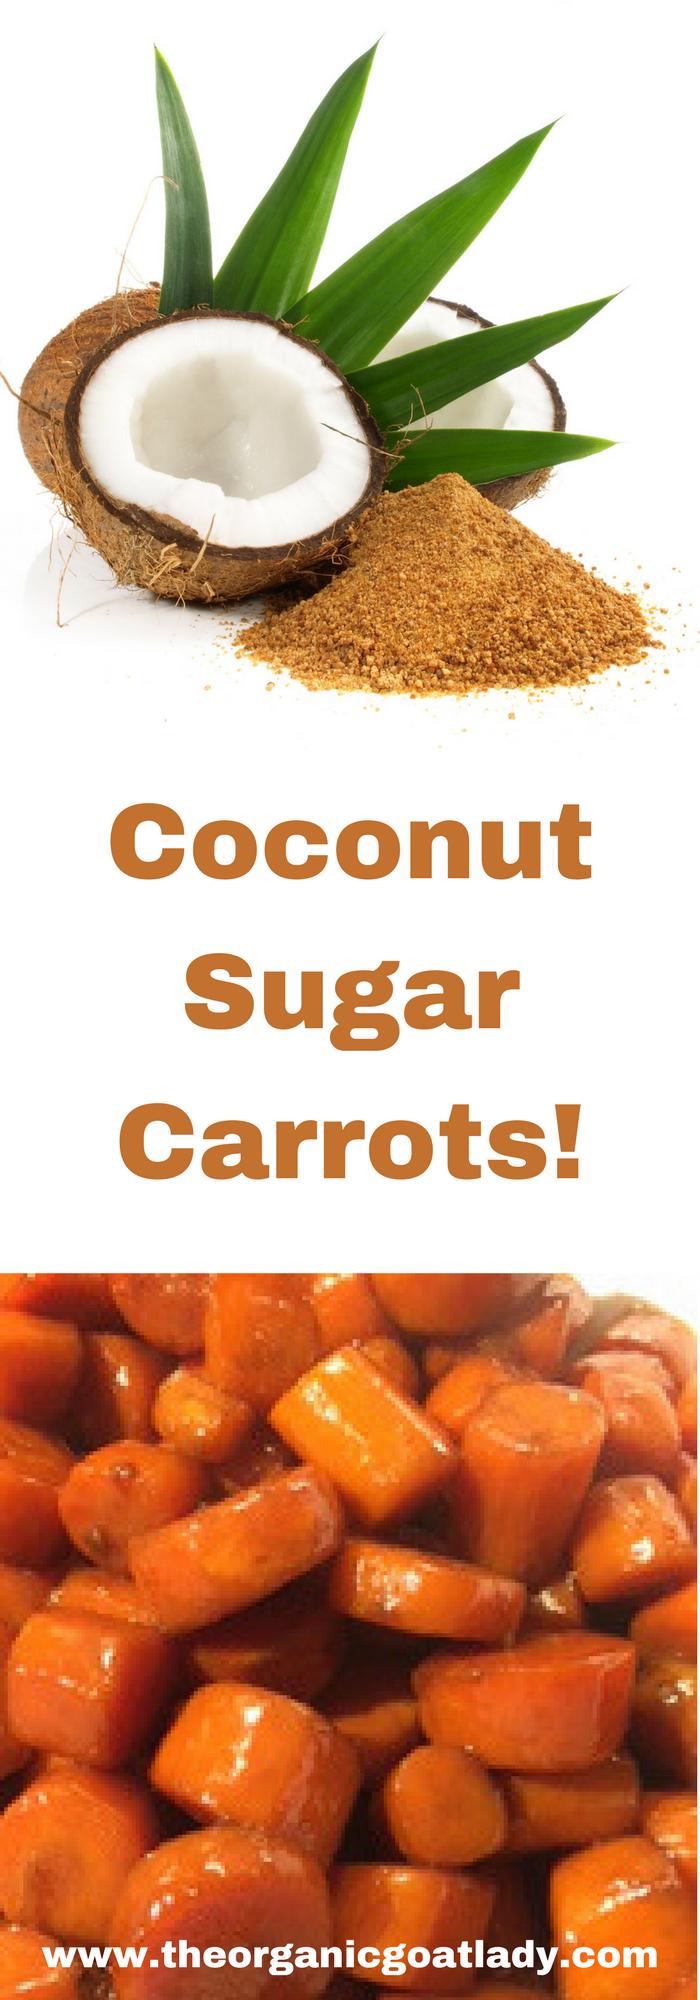 Coconut Sugar Carrots!